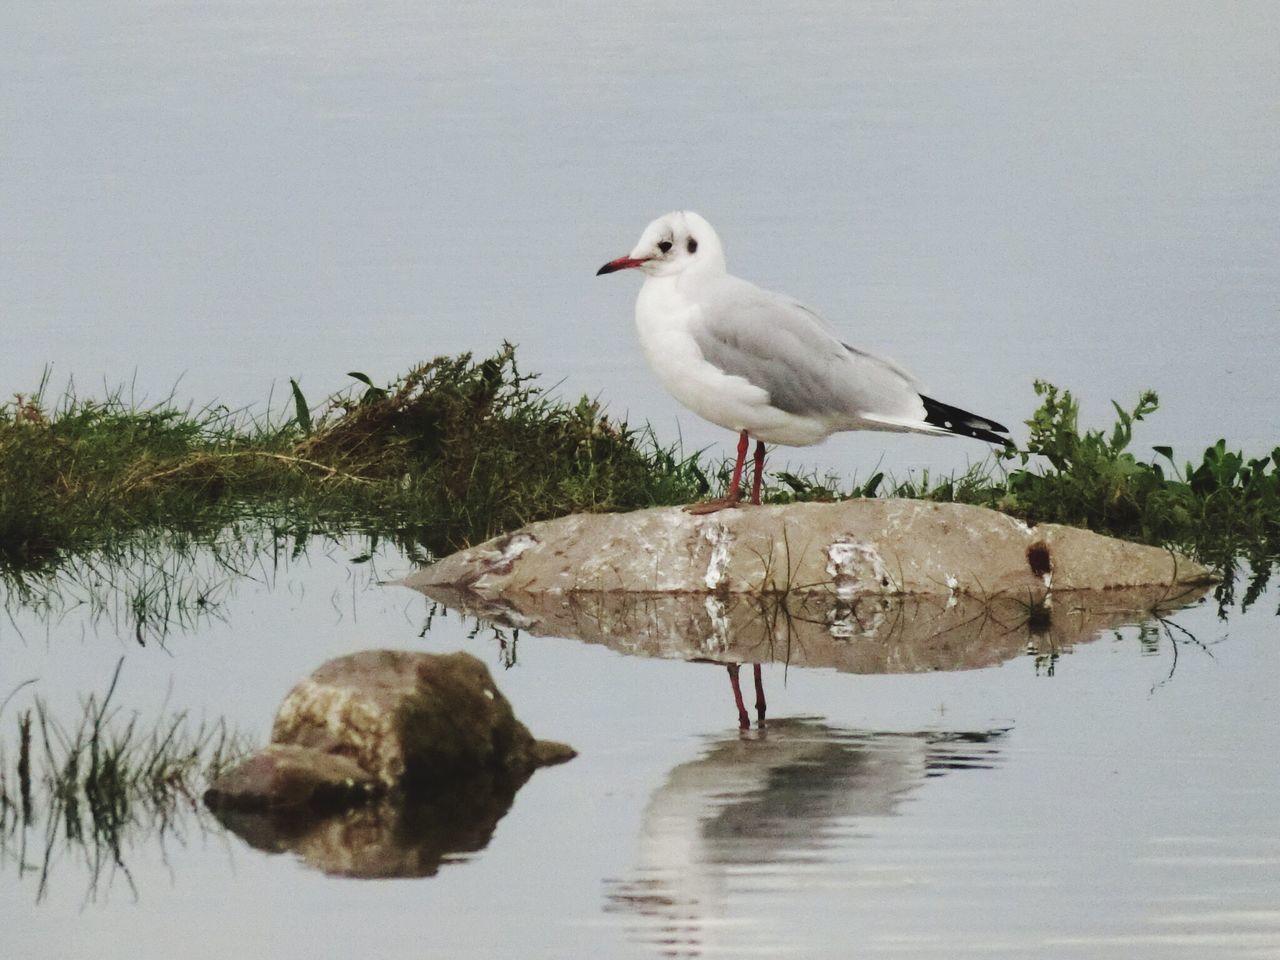 Animal Themes Bird Animals In The Wild Animal Wildlife Water Nature Beauty In Nature